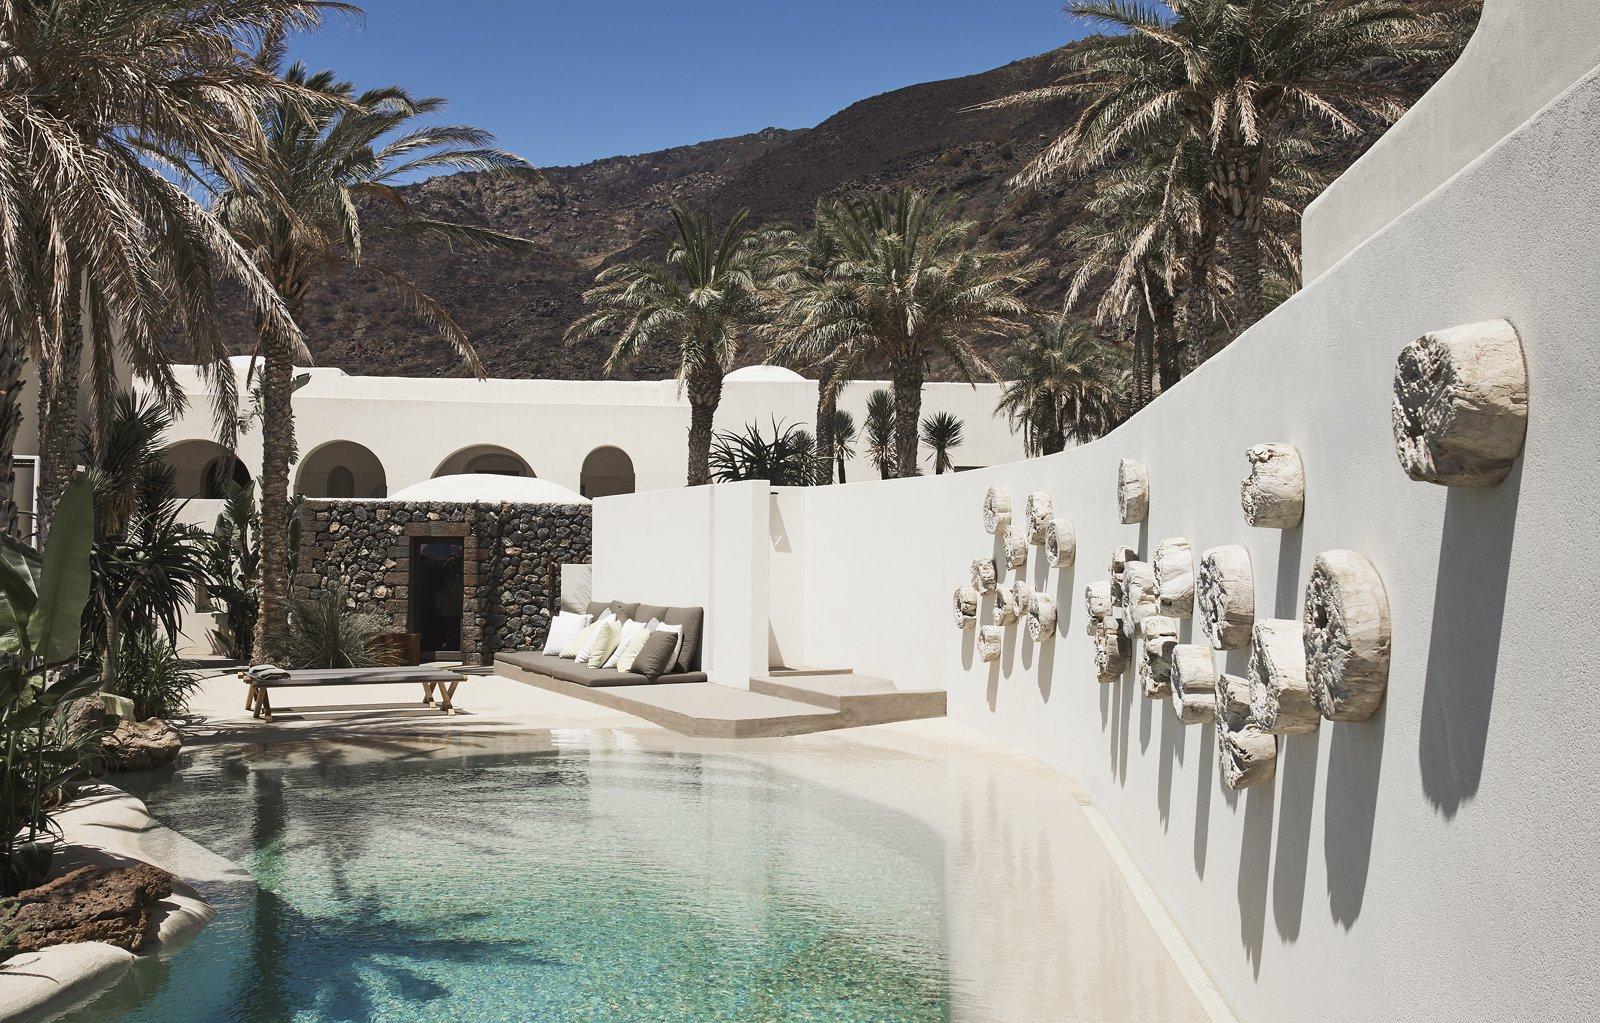 Sikelia Pantelleria Luxury Hotel ***** , Pantelleria-Sicily  / Italy